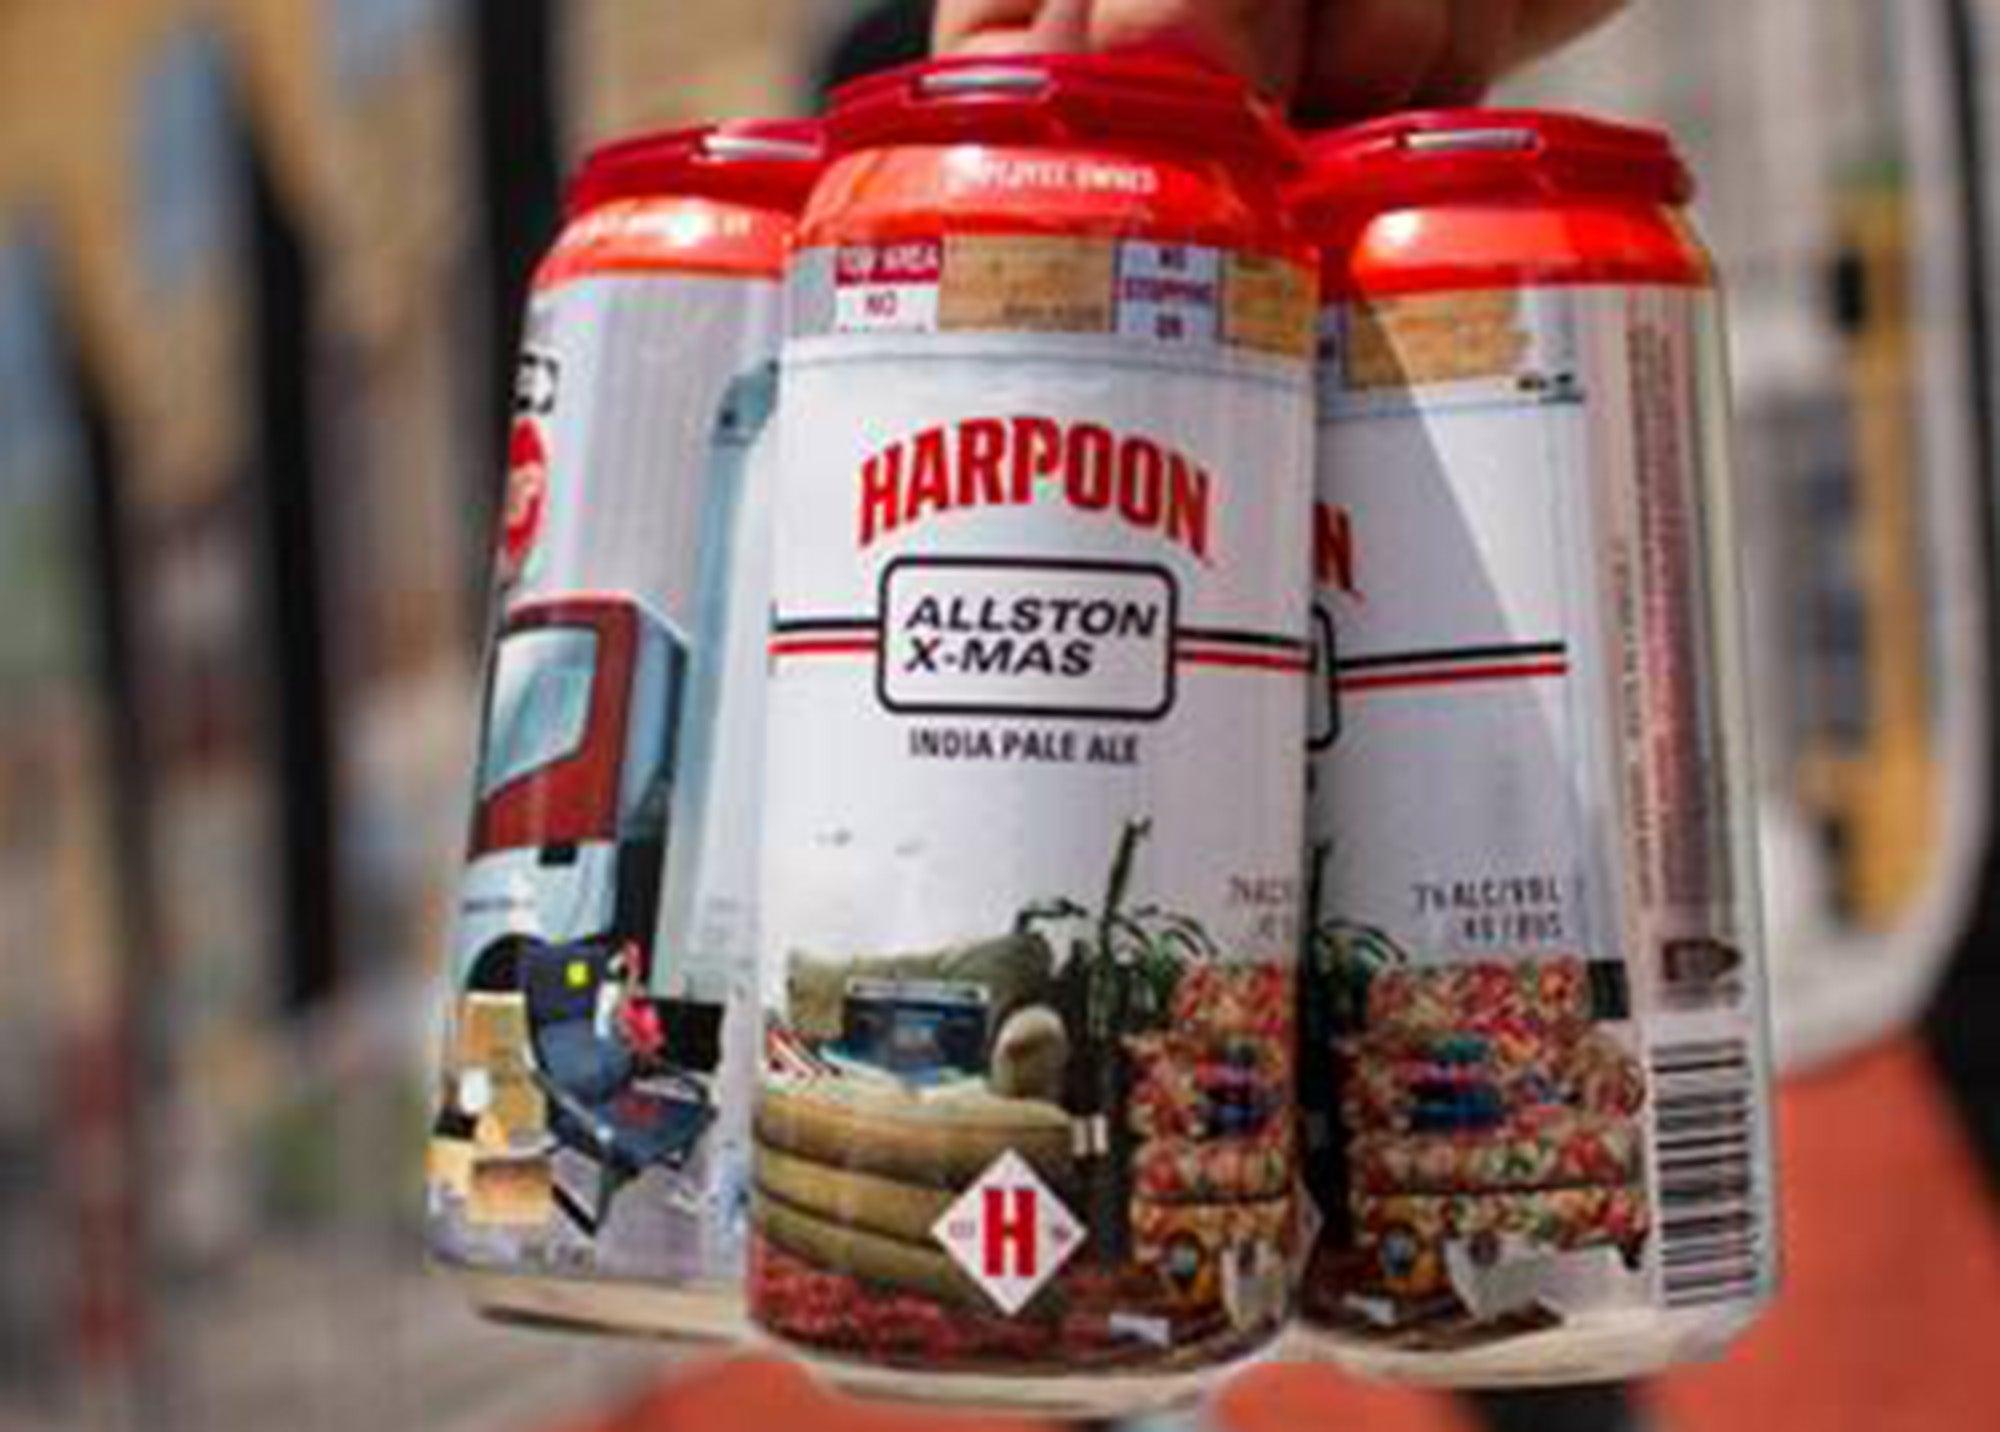 Harpoon Brewery's Allston X-Mas